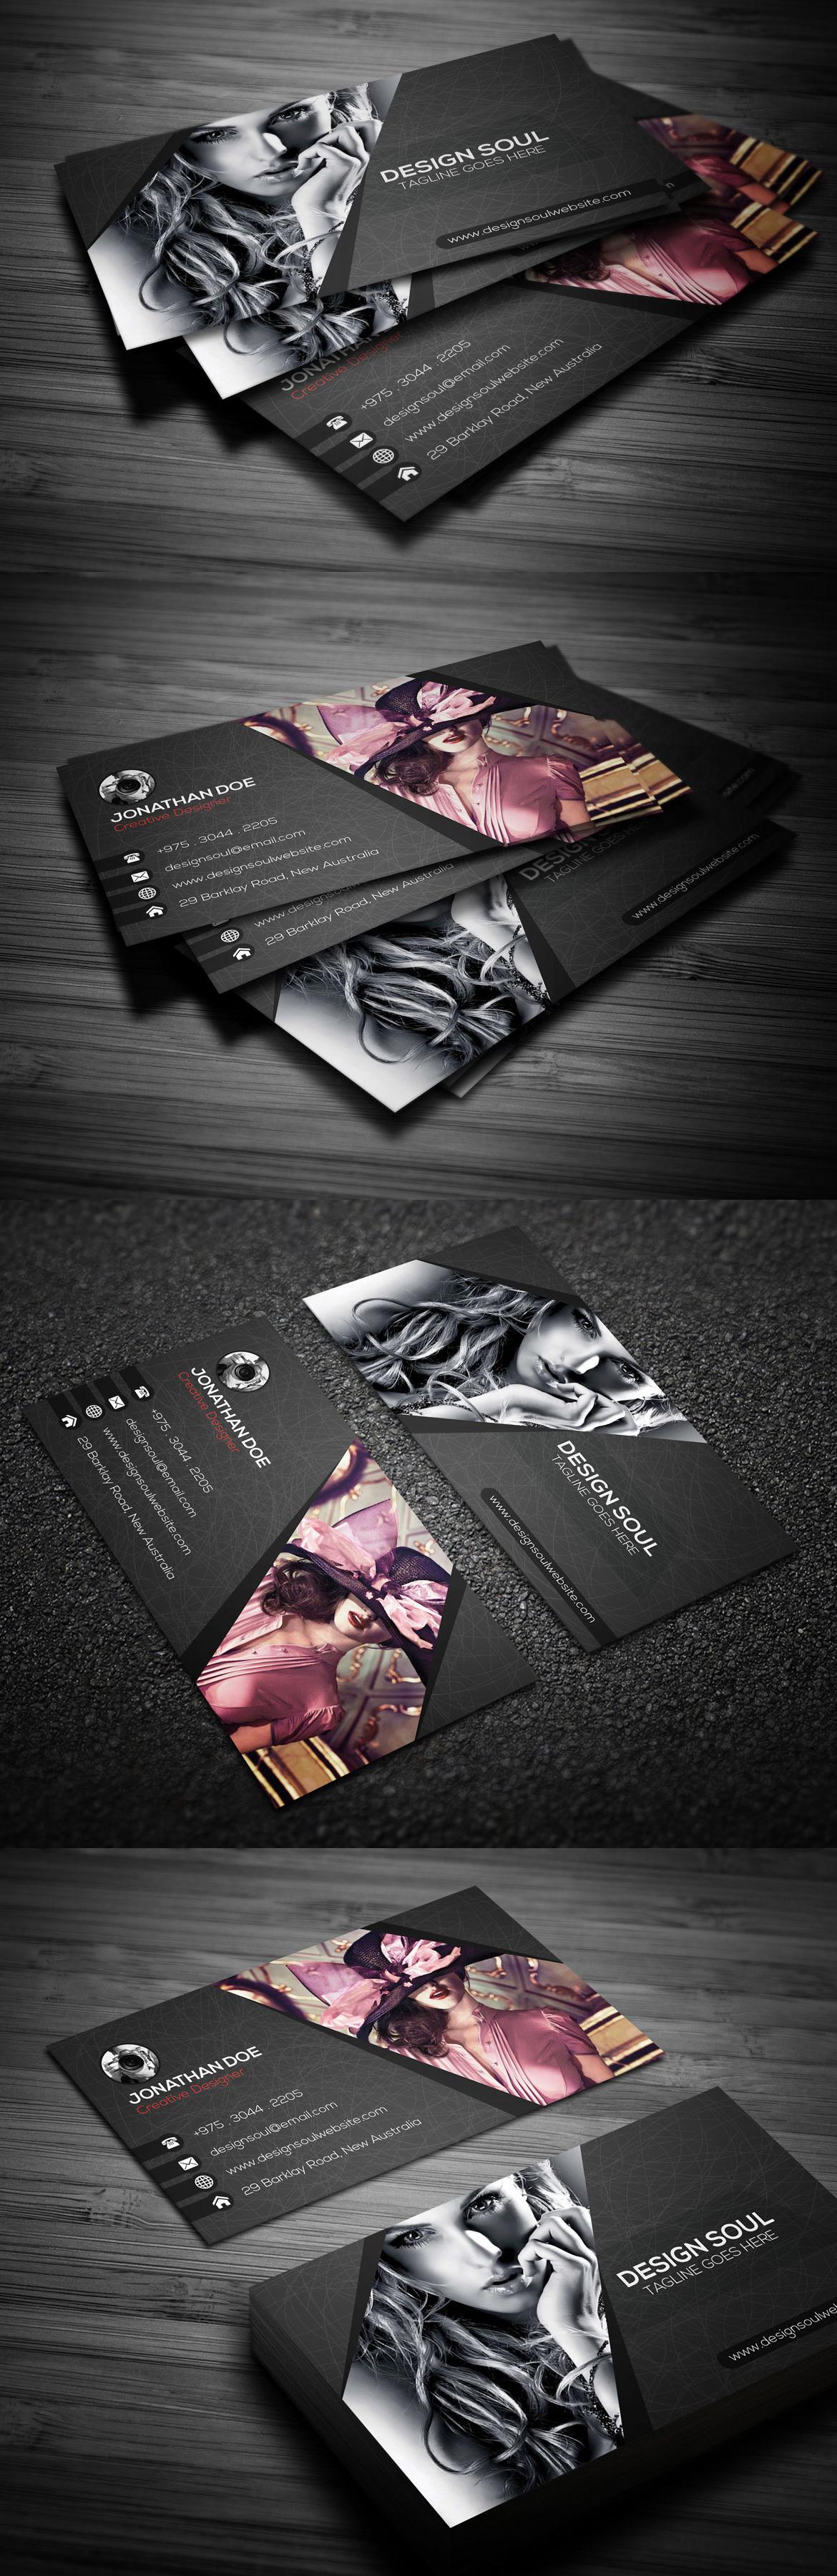 Photography Business Card Template PSD | Business Card Templates ...